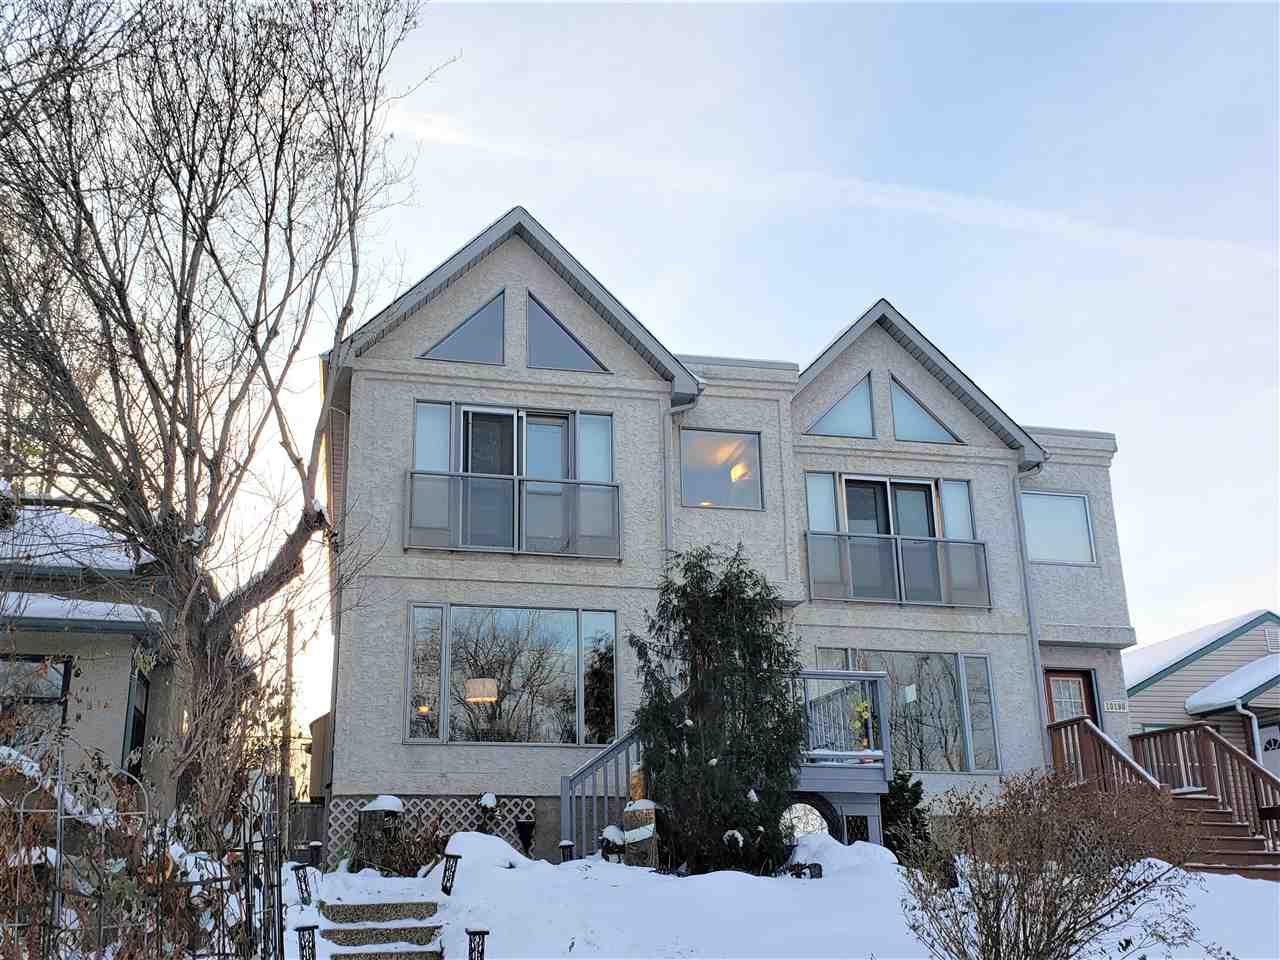 Main Photo: 10188 87 Street in Edmonton: Zone 13 House Half Duplex for sale : MLS®# E4220134